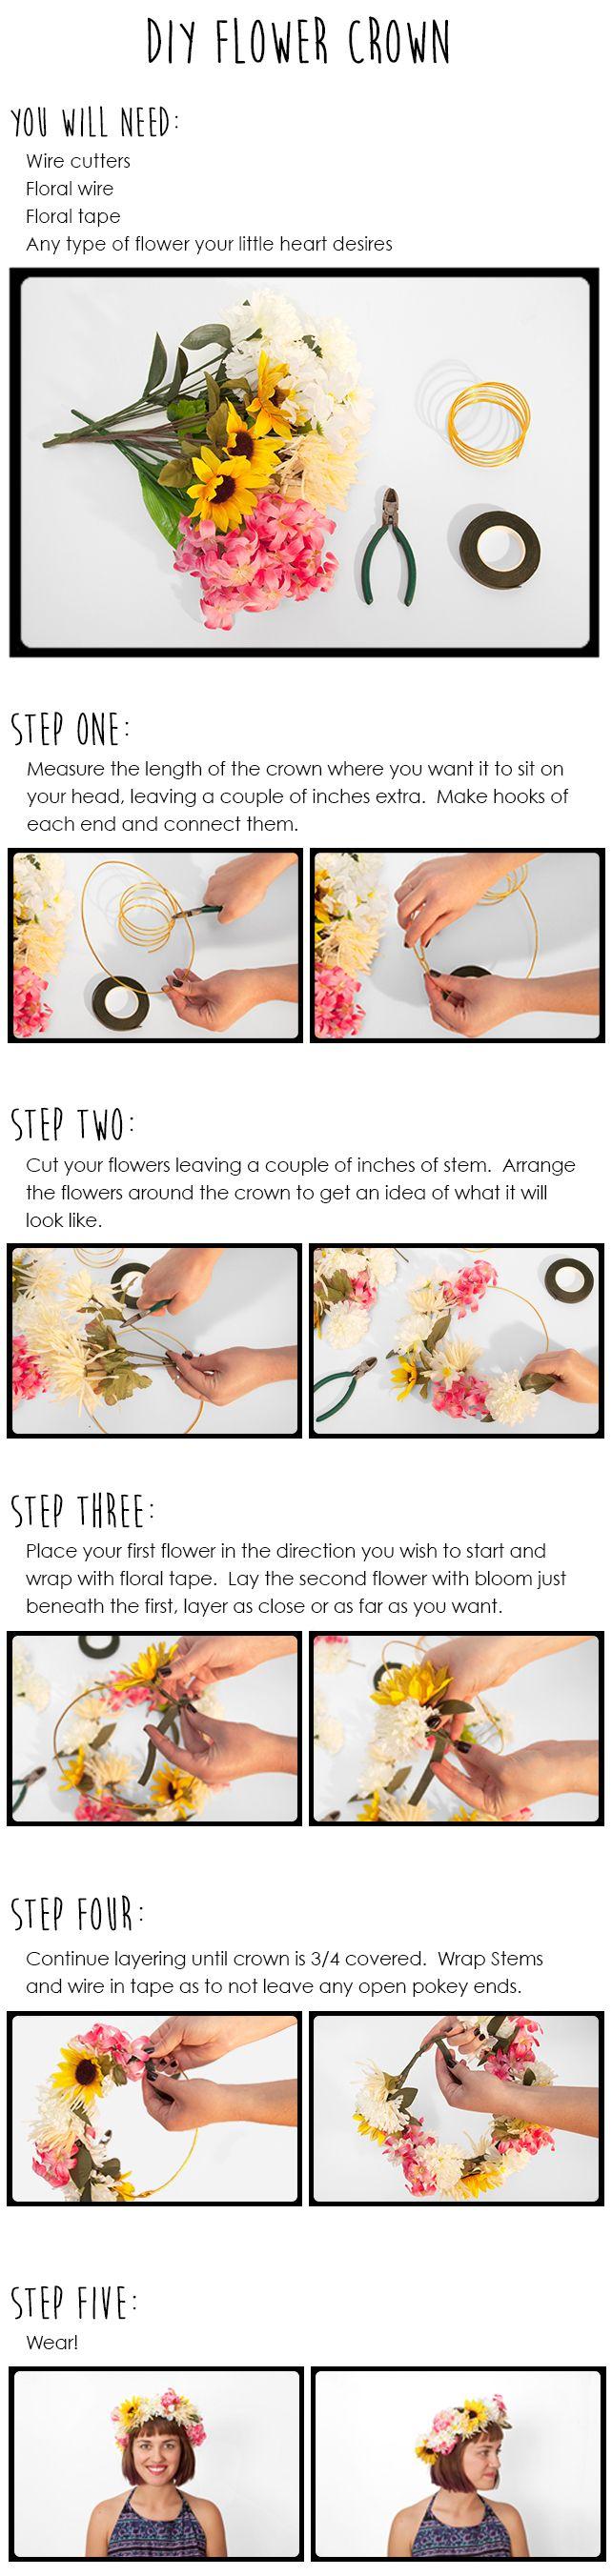 DIY Festival Flower Crown Tutorial